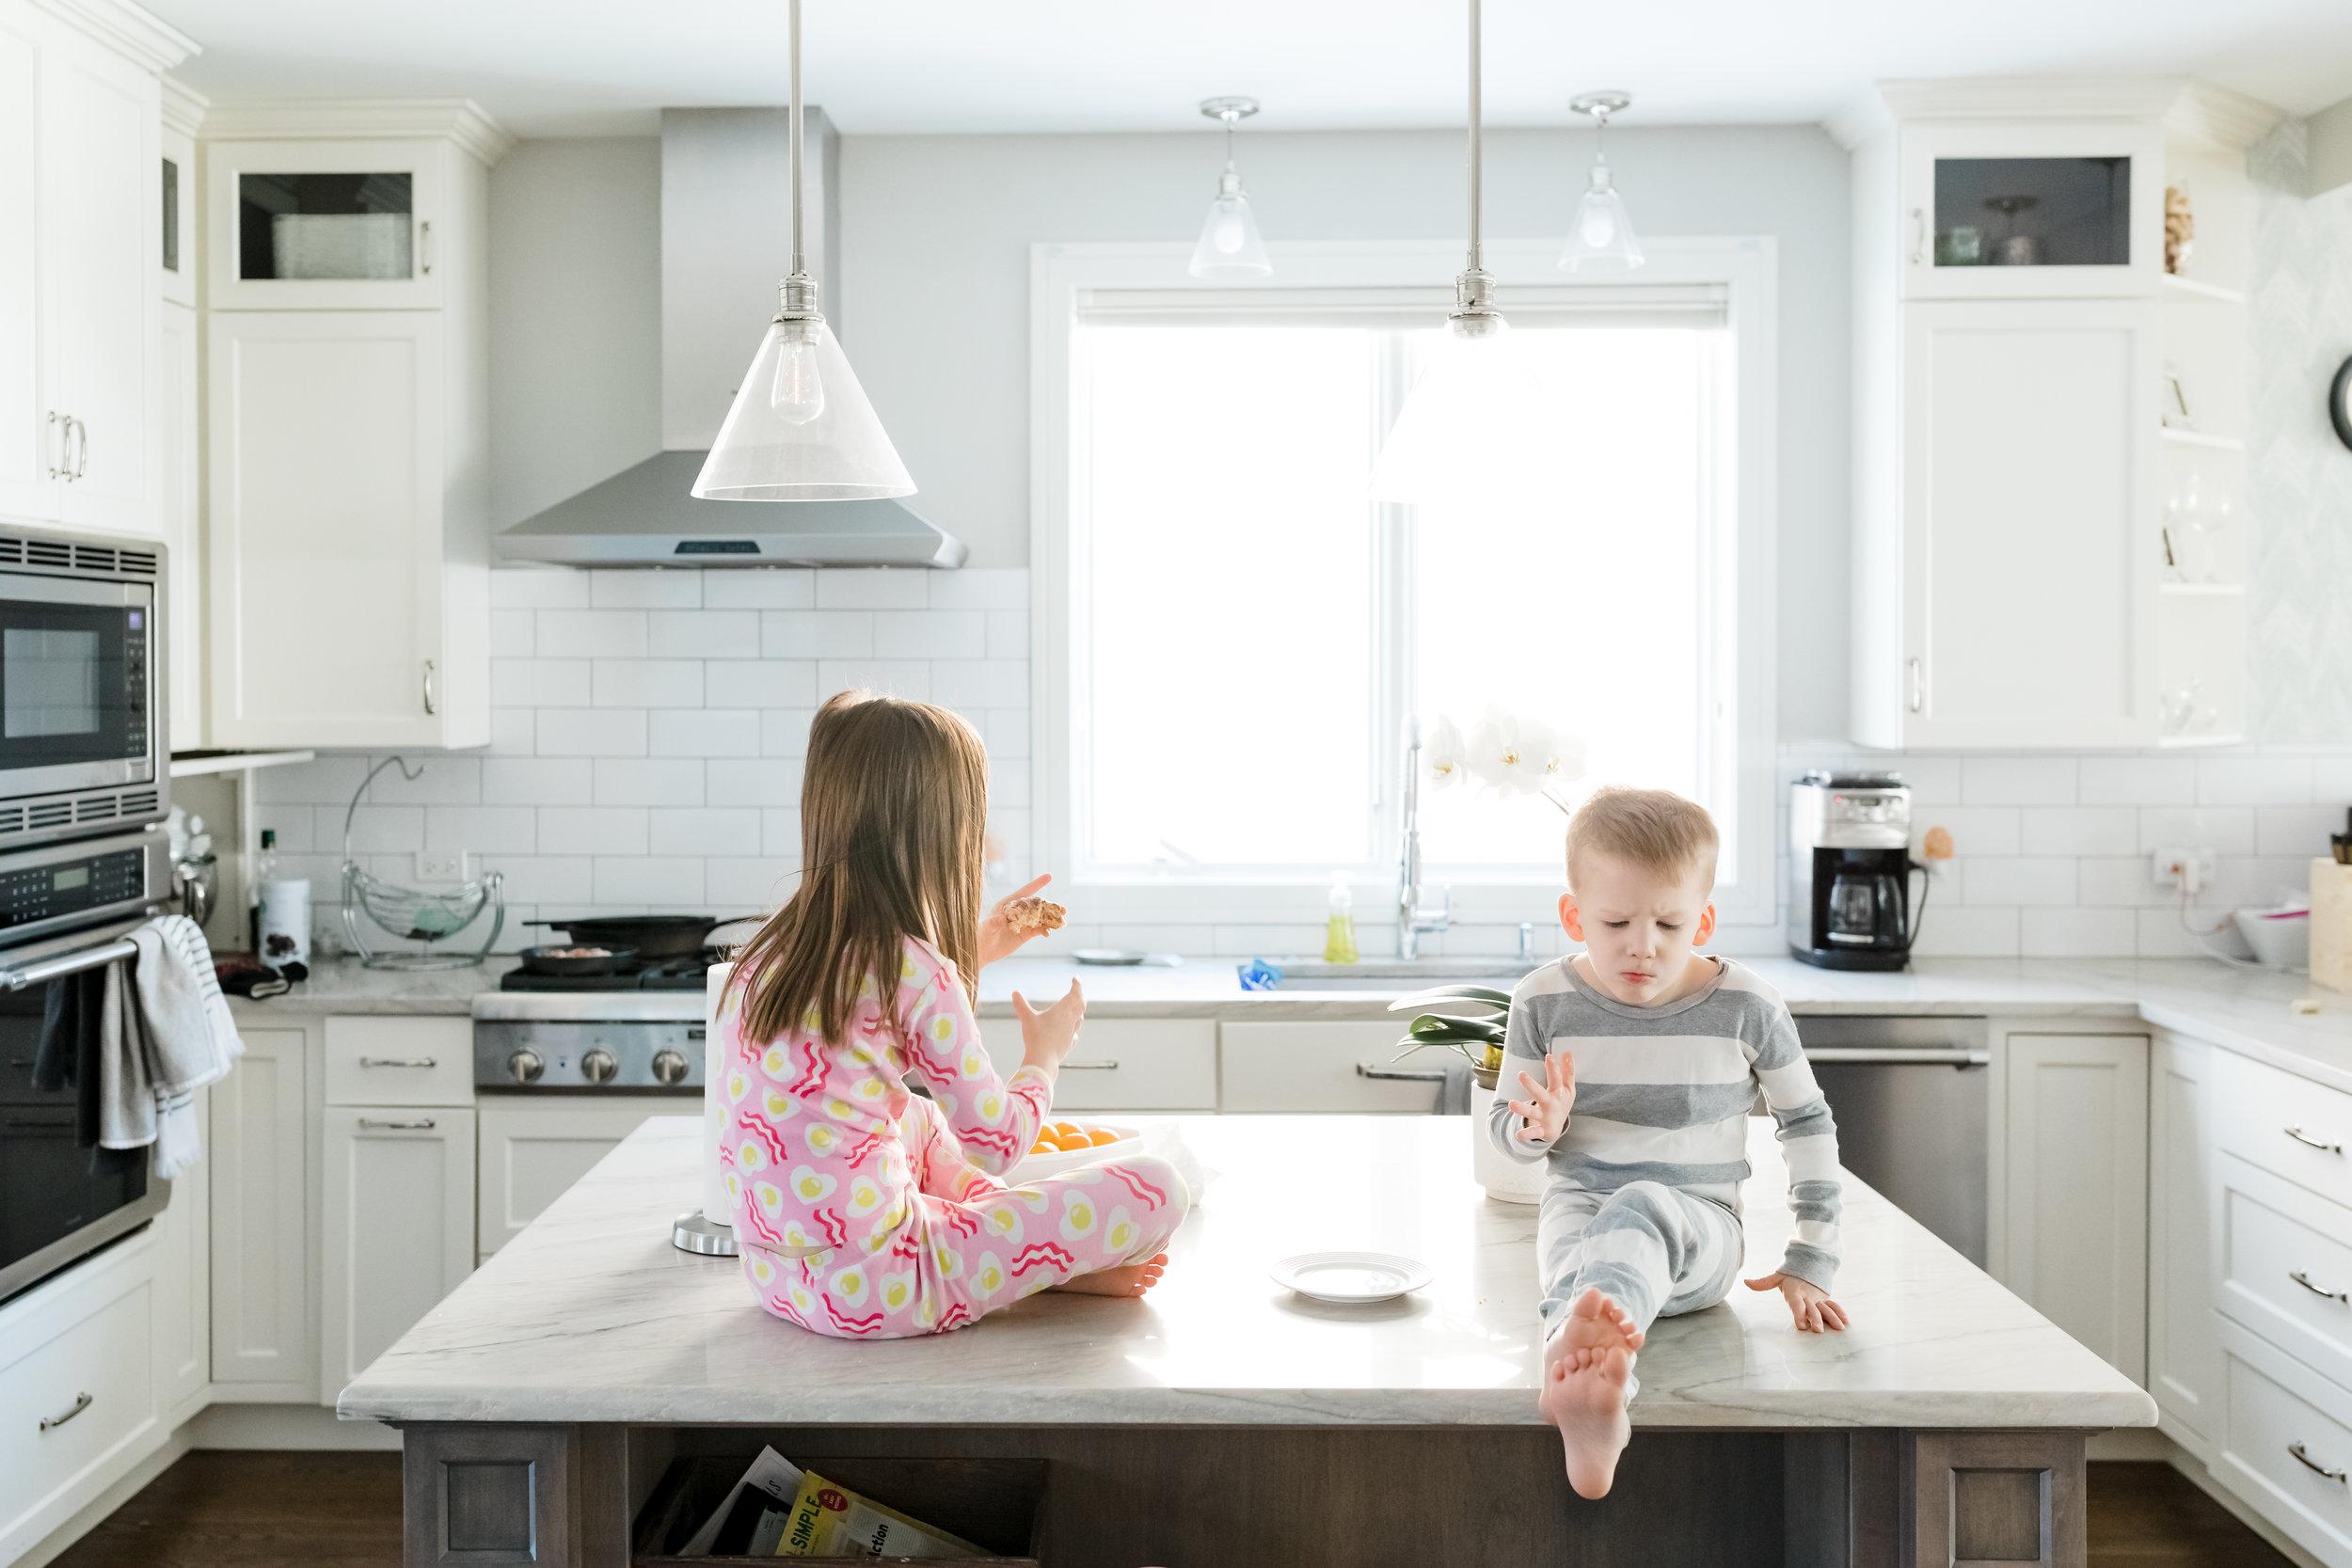 jenny grimm chicago lifestyle family photographer kitchen kids